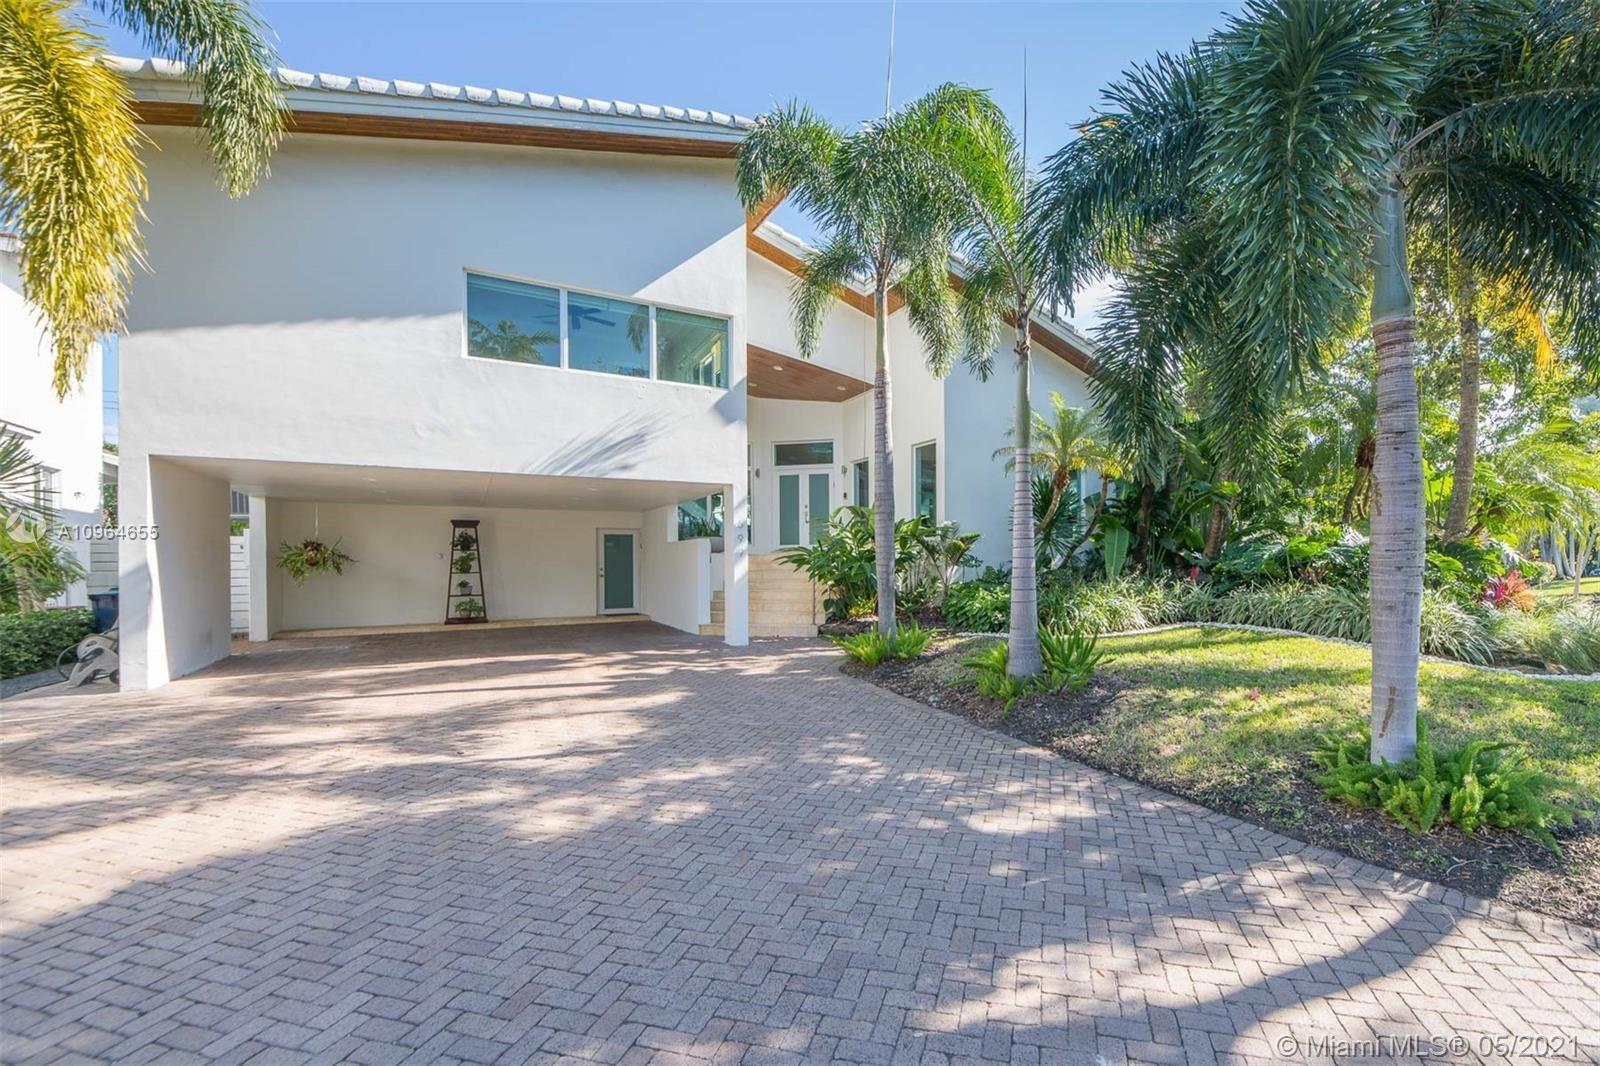 699 Glenridge Rd, Key Biscayne, FL 33149 - #: A10964655